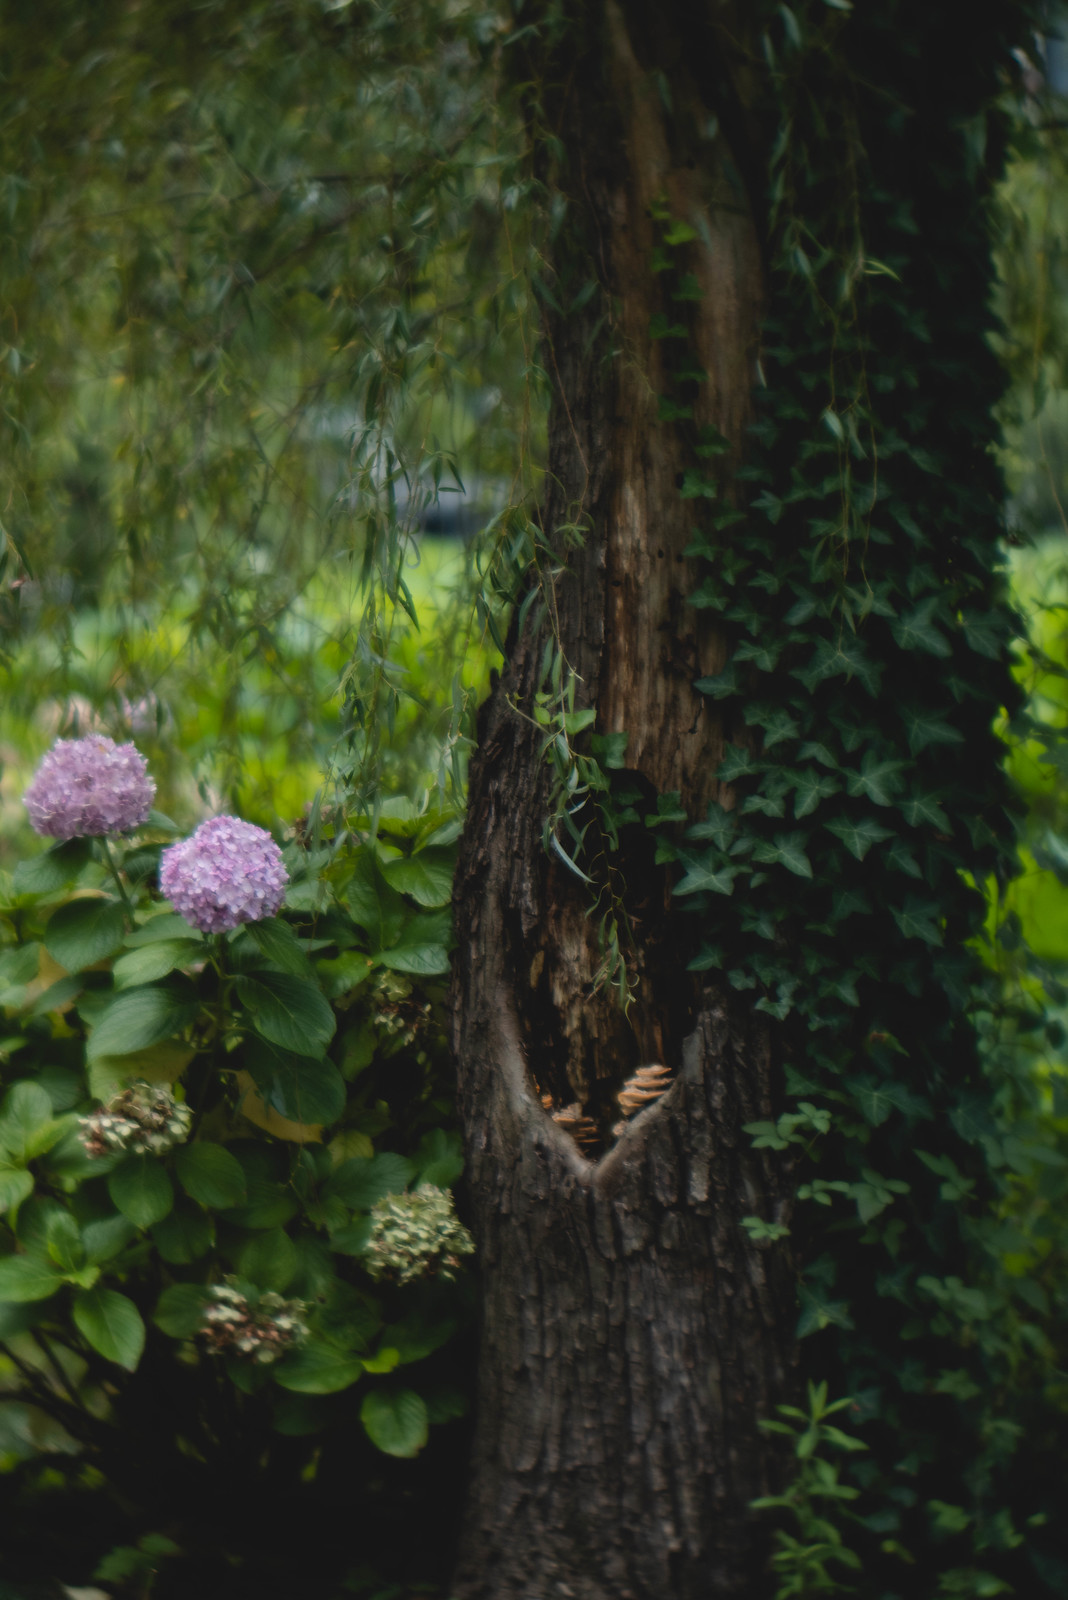 ivy, trees, and hydrangea